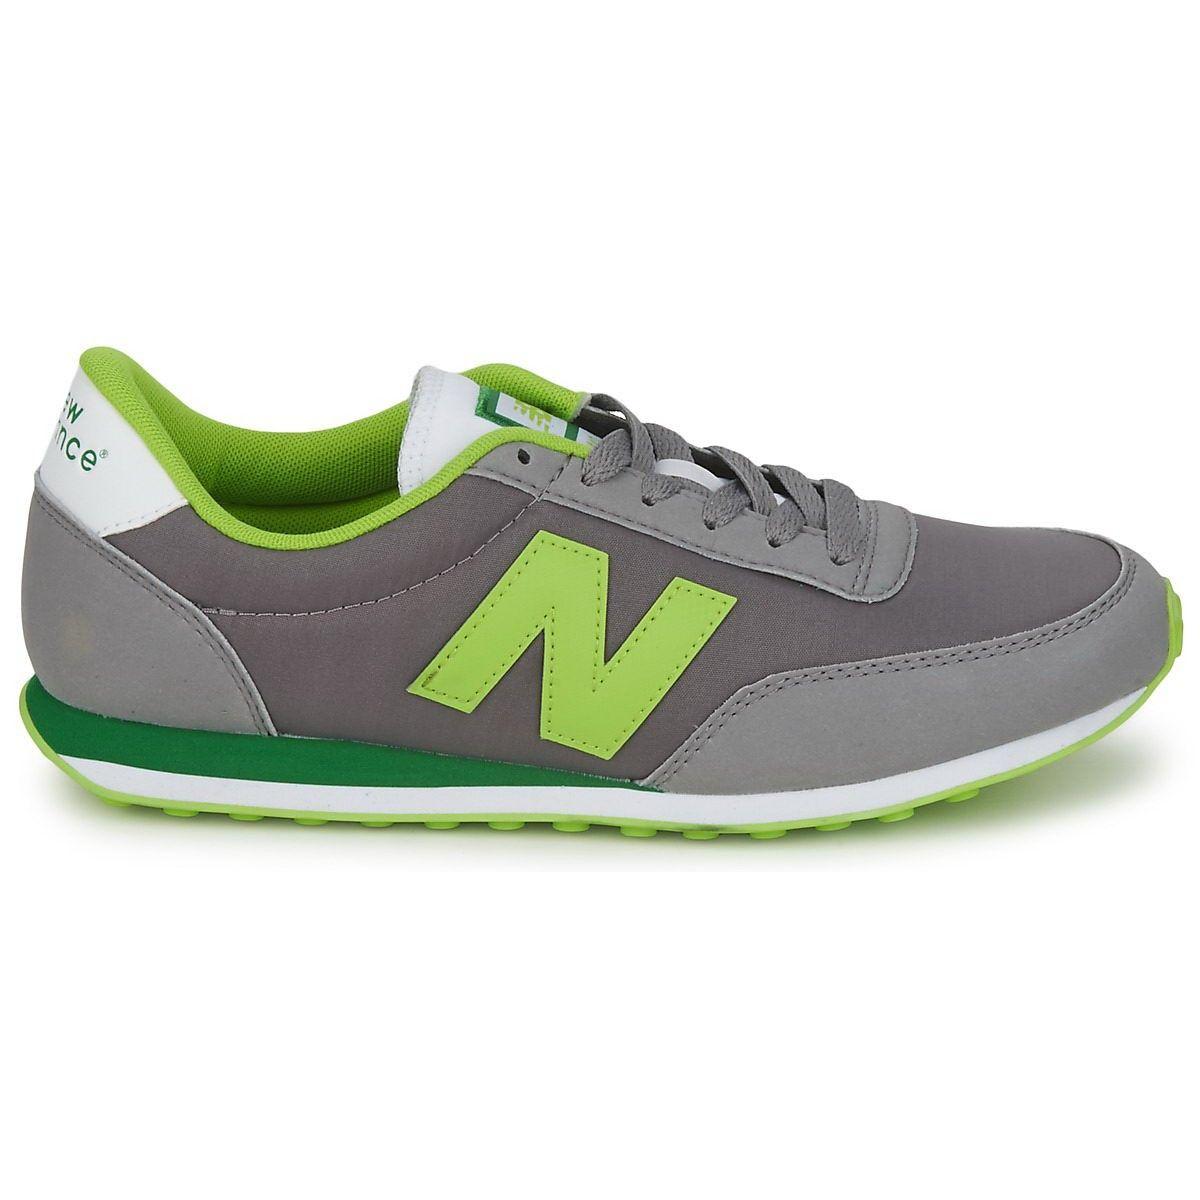 Säga Nio slaktare  New Balance 410 Men's Grey Green U410 | New balance 410, New ...